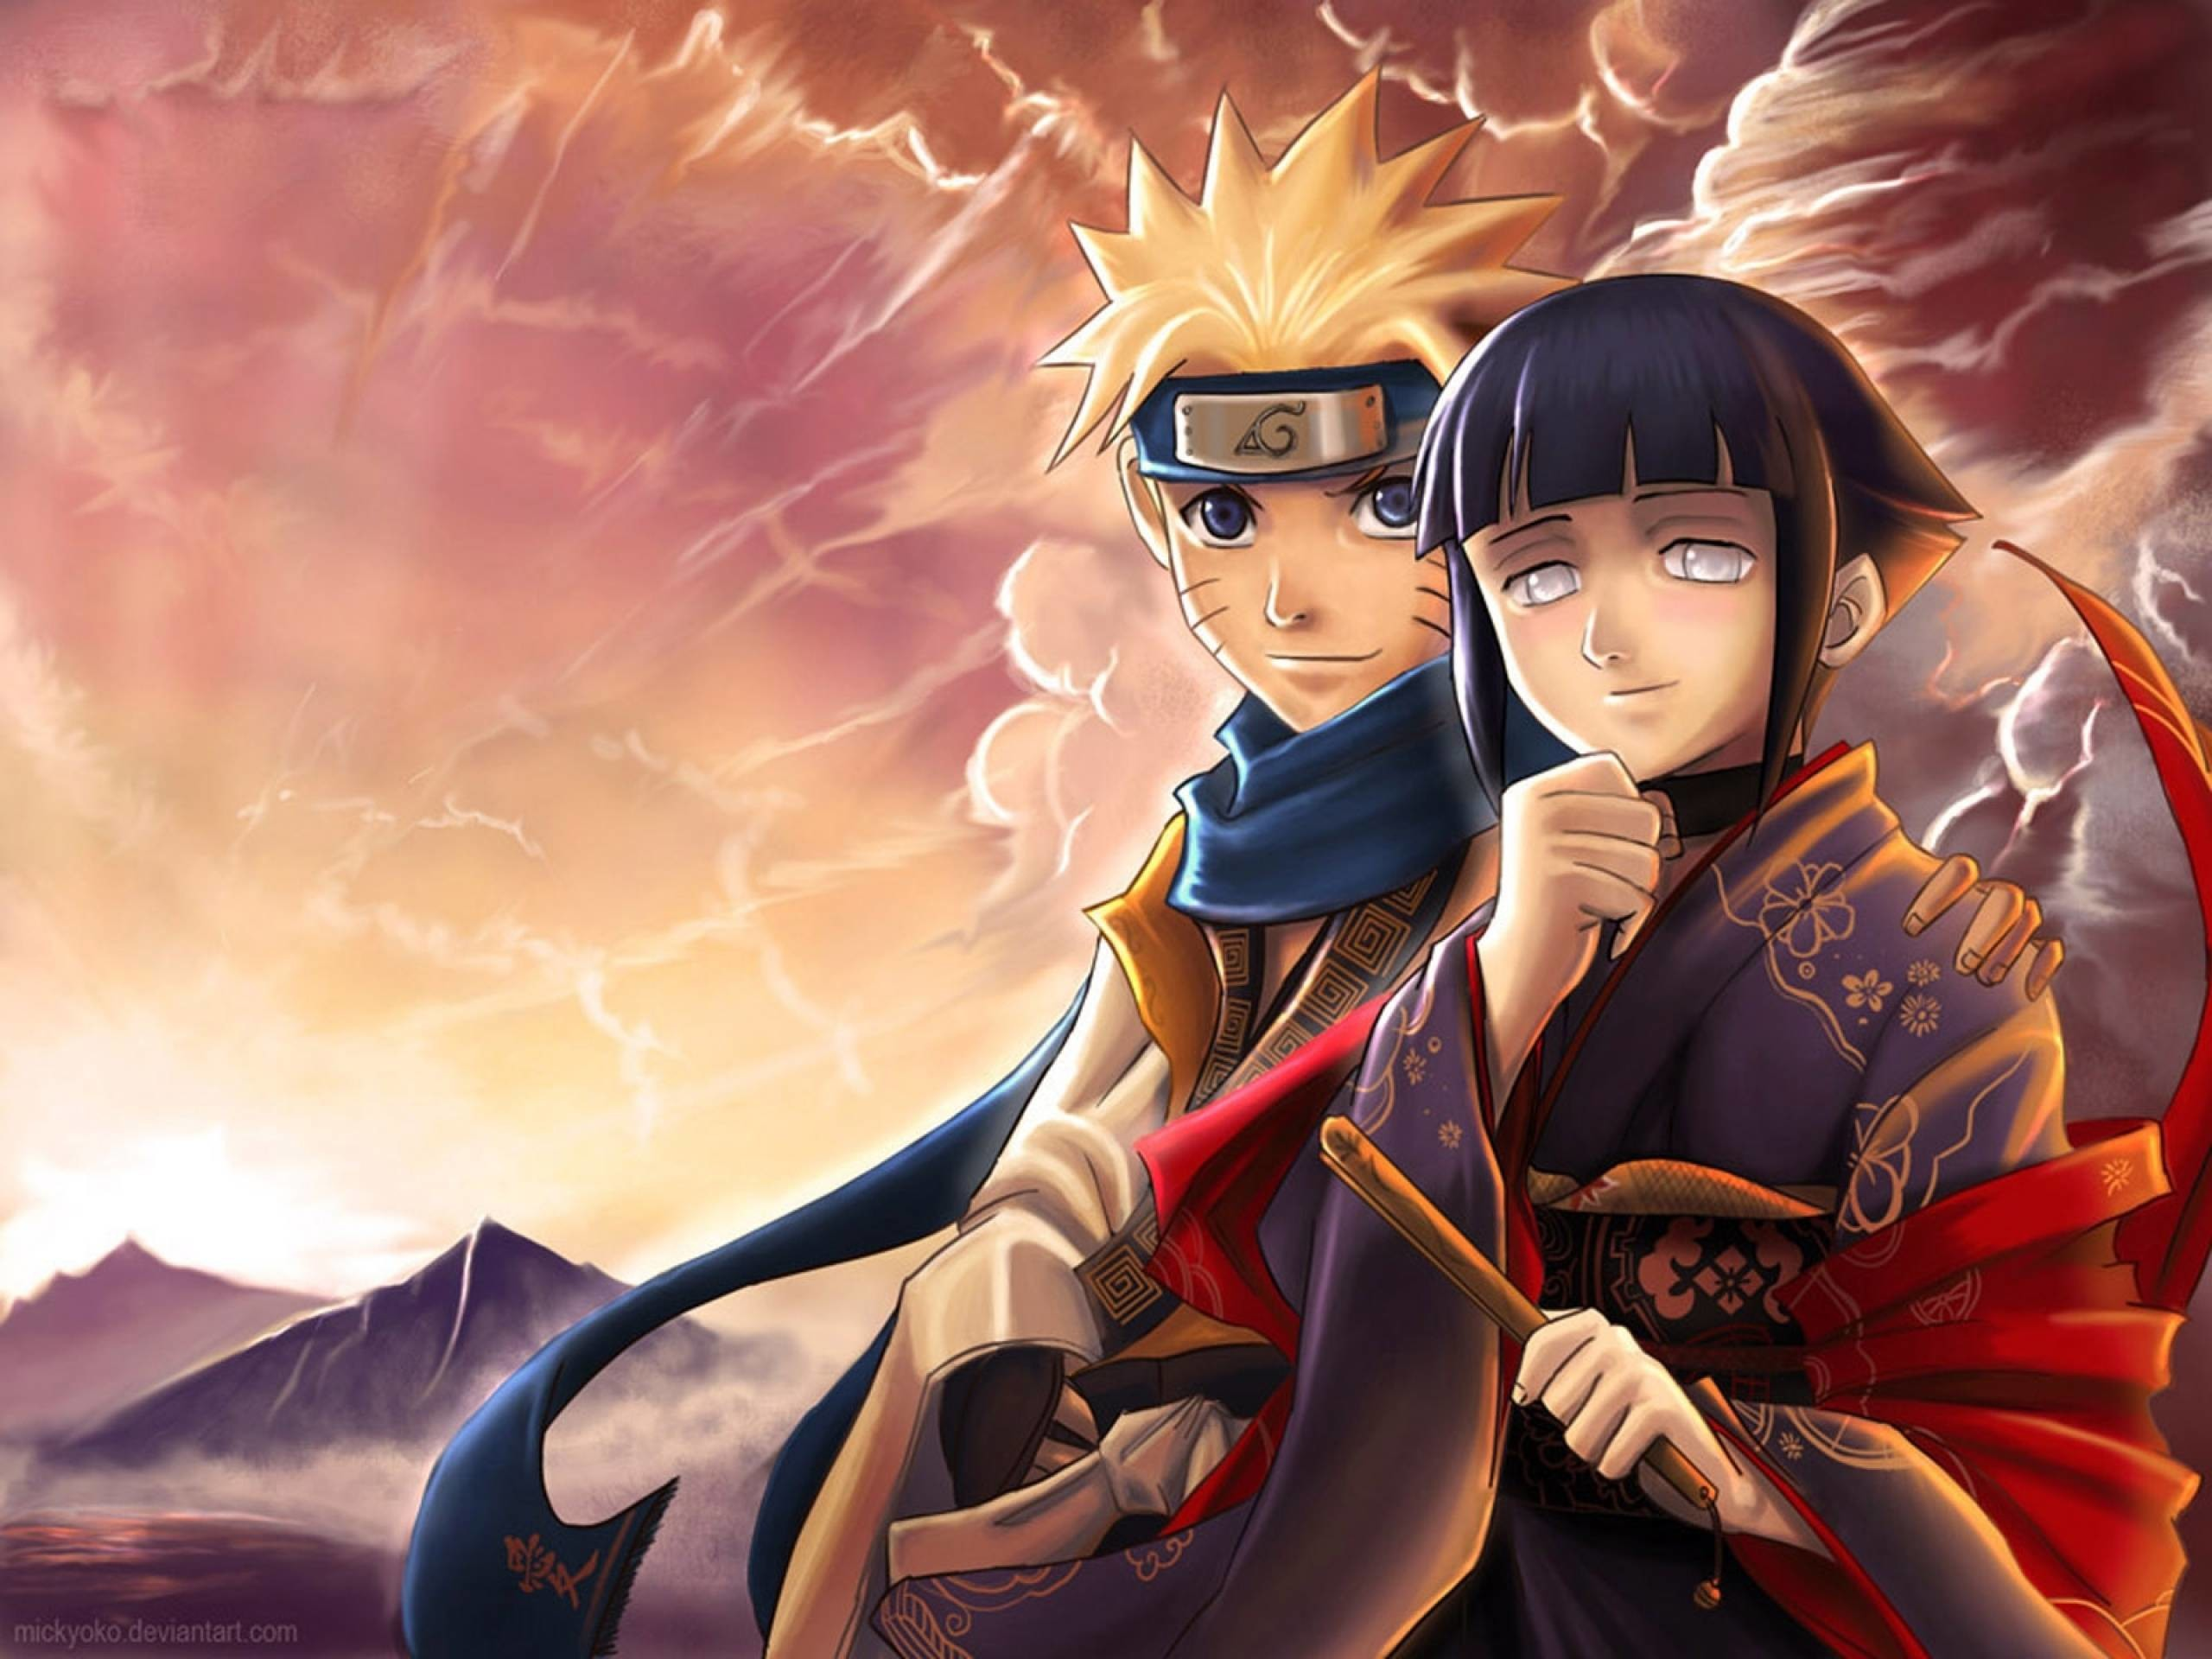 Fantastic Wallpaper Naruto Galaxy S6 - 714159-download-naruto-shippuden-wallpaper-terbaru-2018-2560x1920  Photograph_446960.jpg